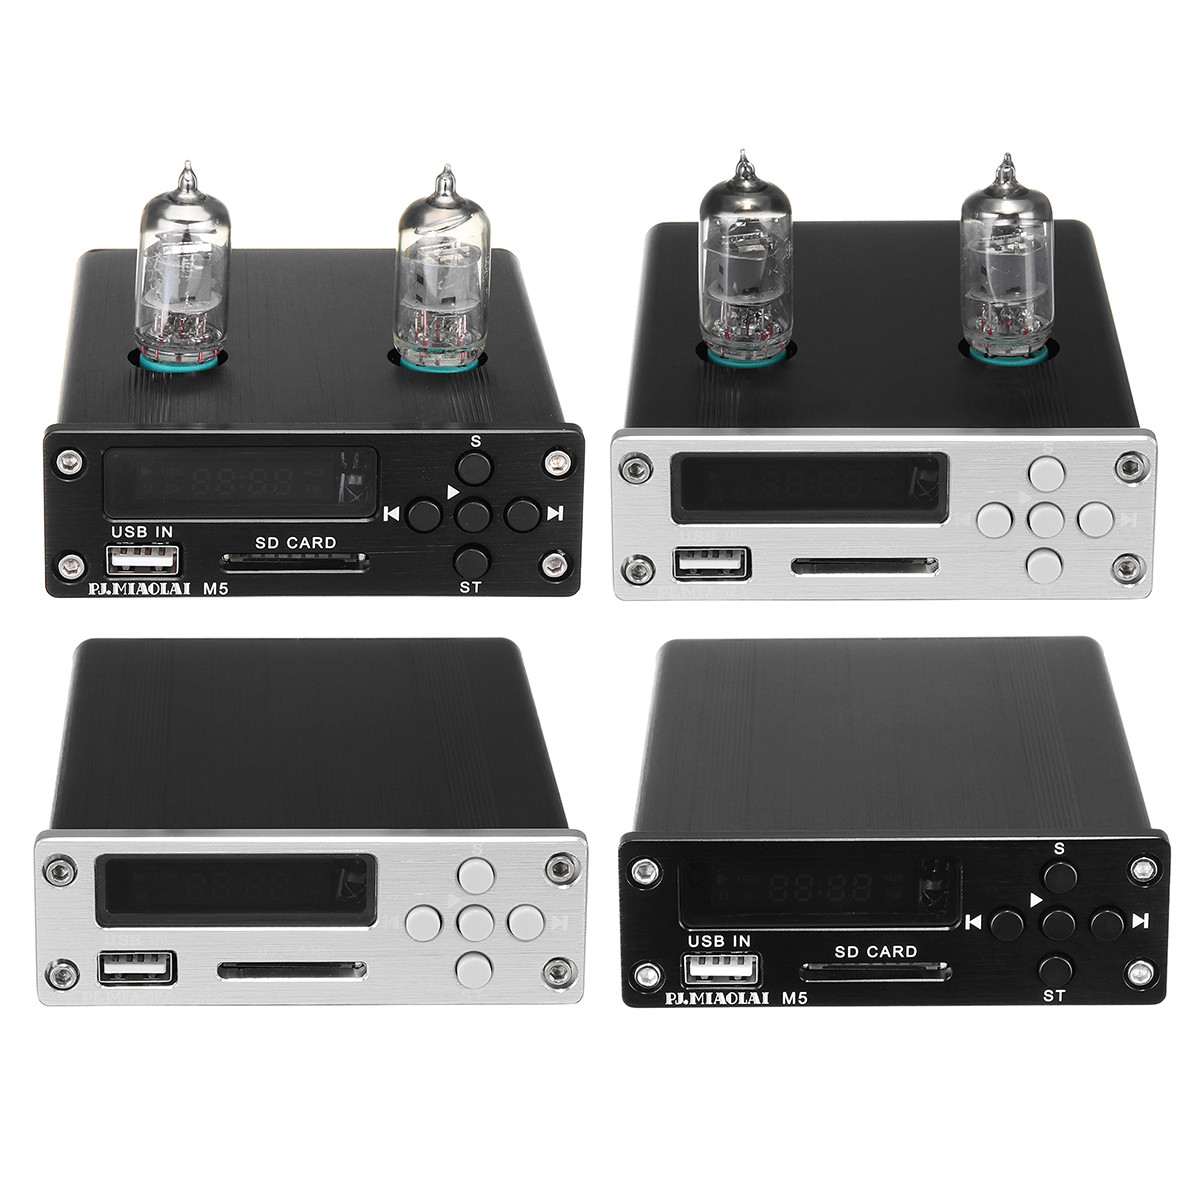 PJ.MIAOLAI M5 6J1 Вакуум Трубка Предварительно усилитель USB DAC Stereo HiFi Buffer Music Player 1TopShop